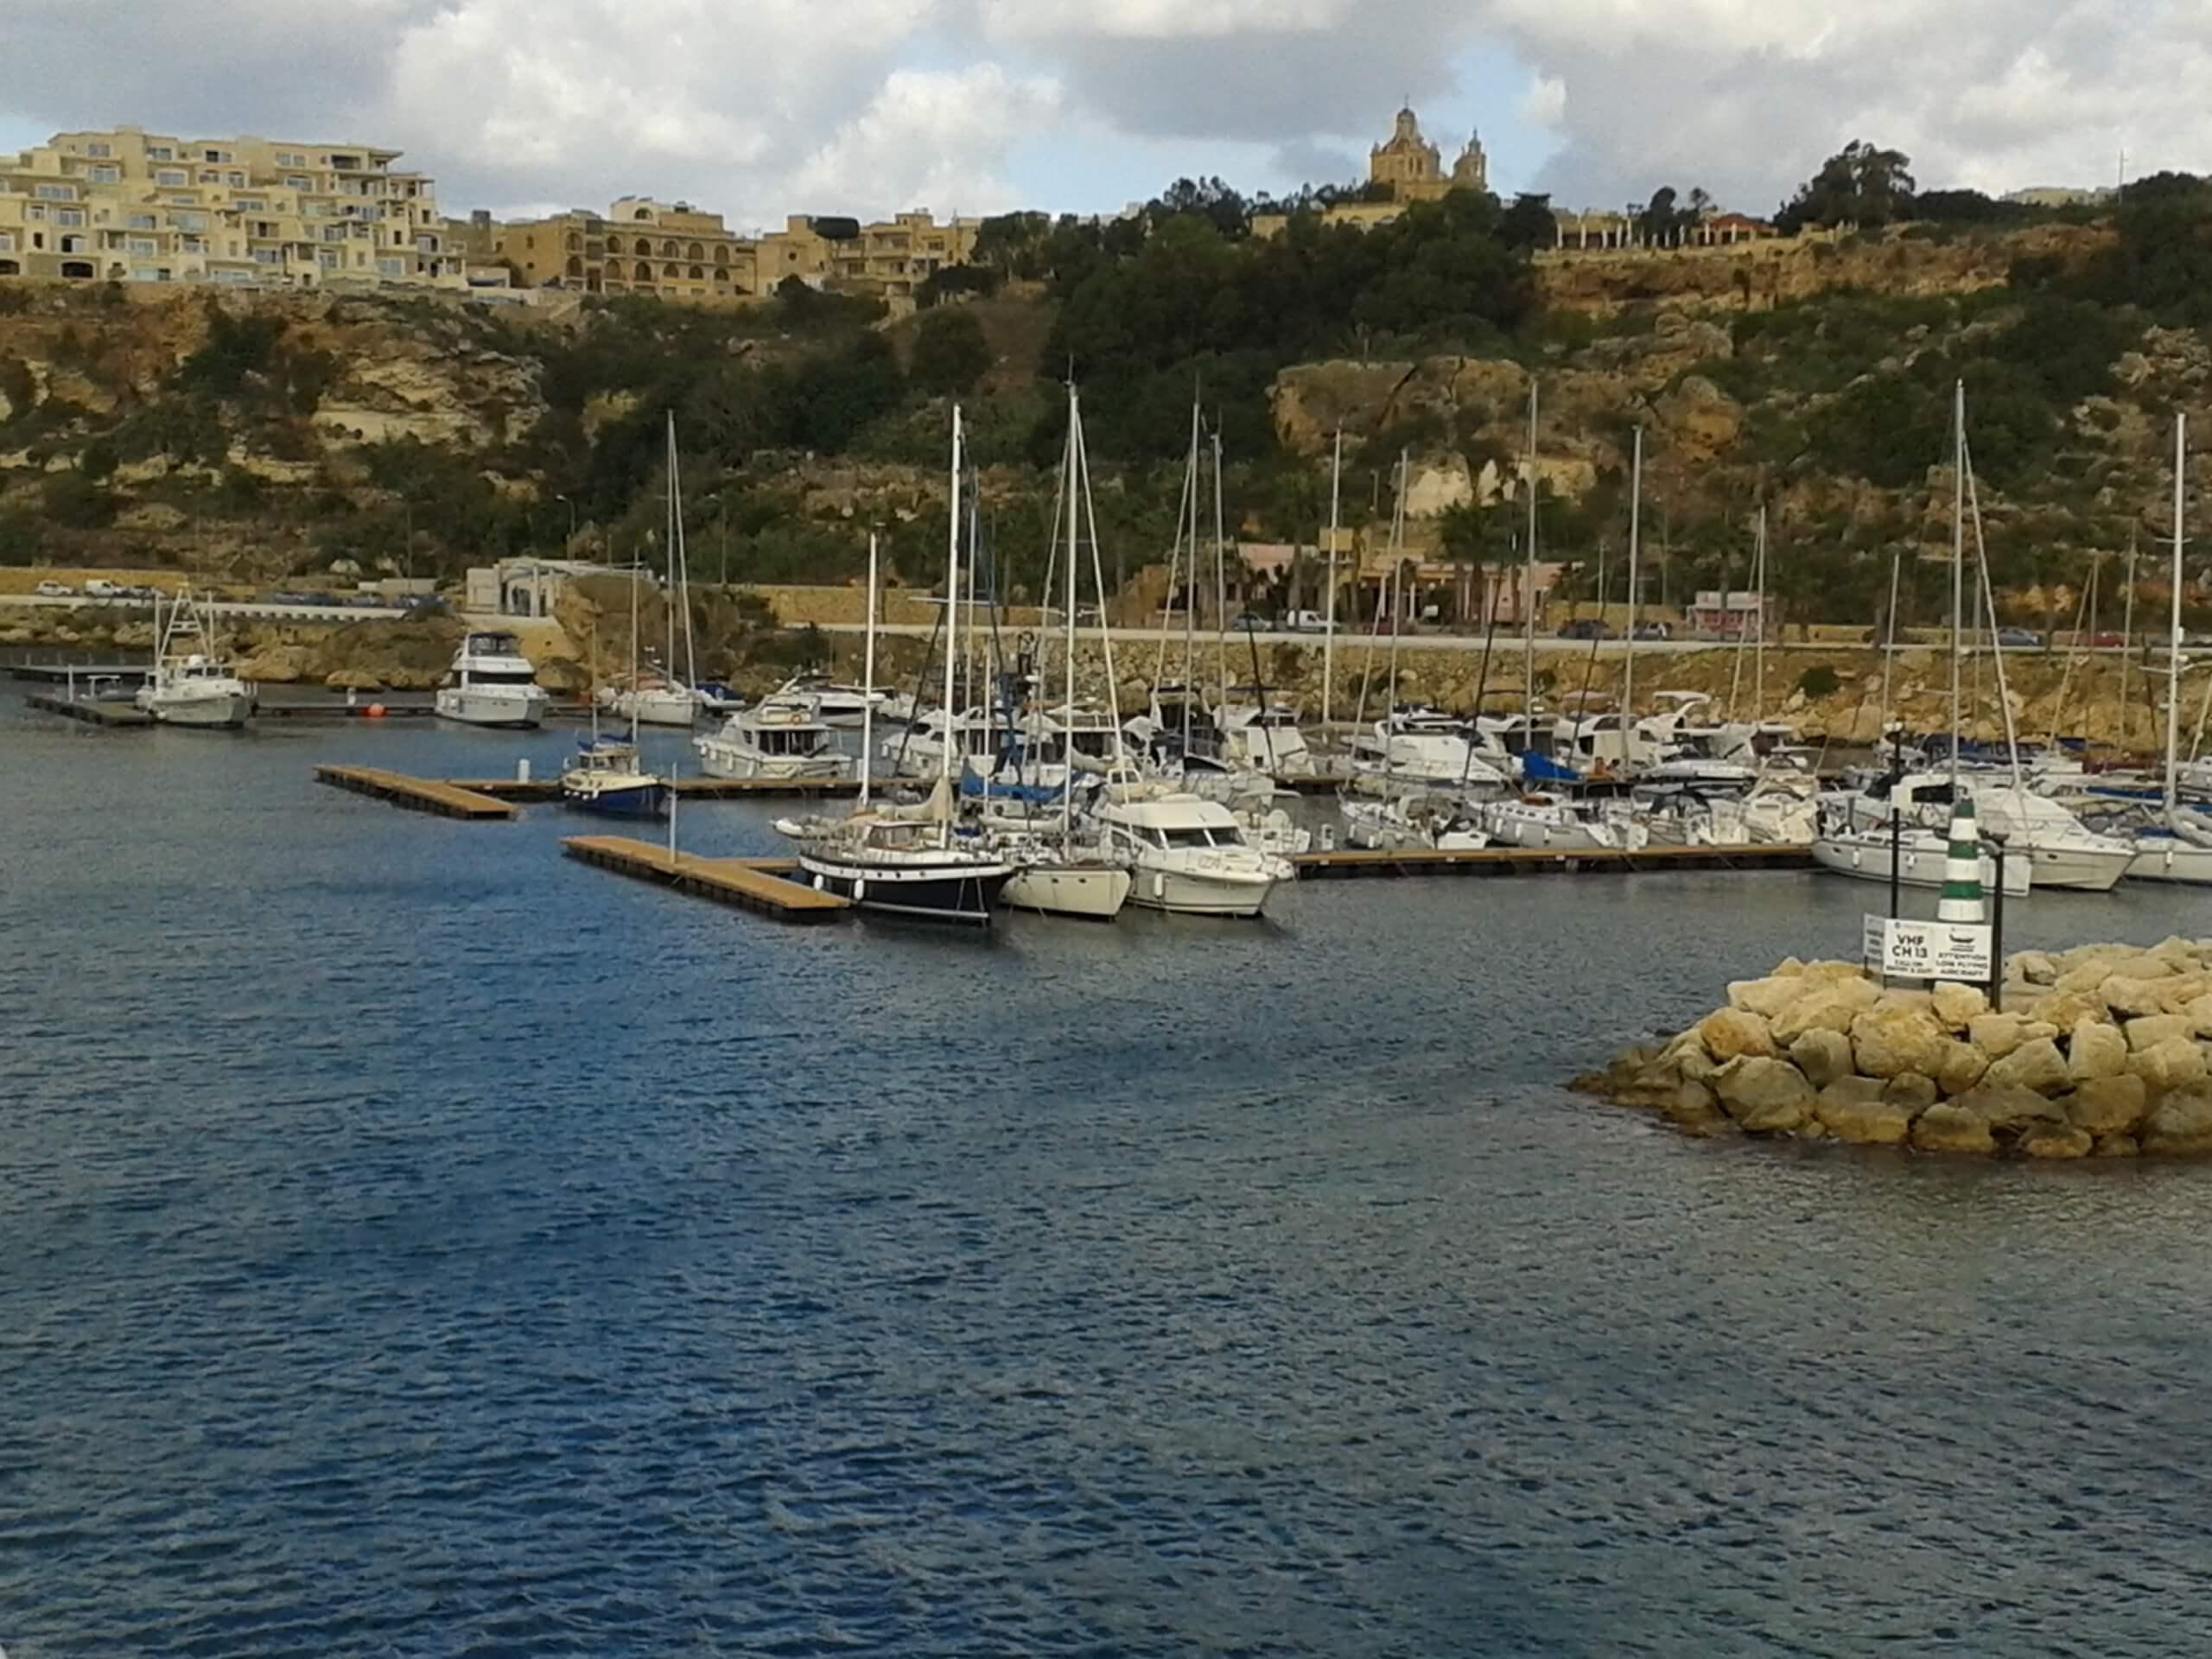 cursos de inglés en malta junior